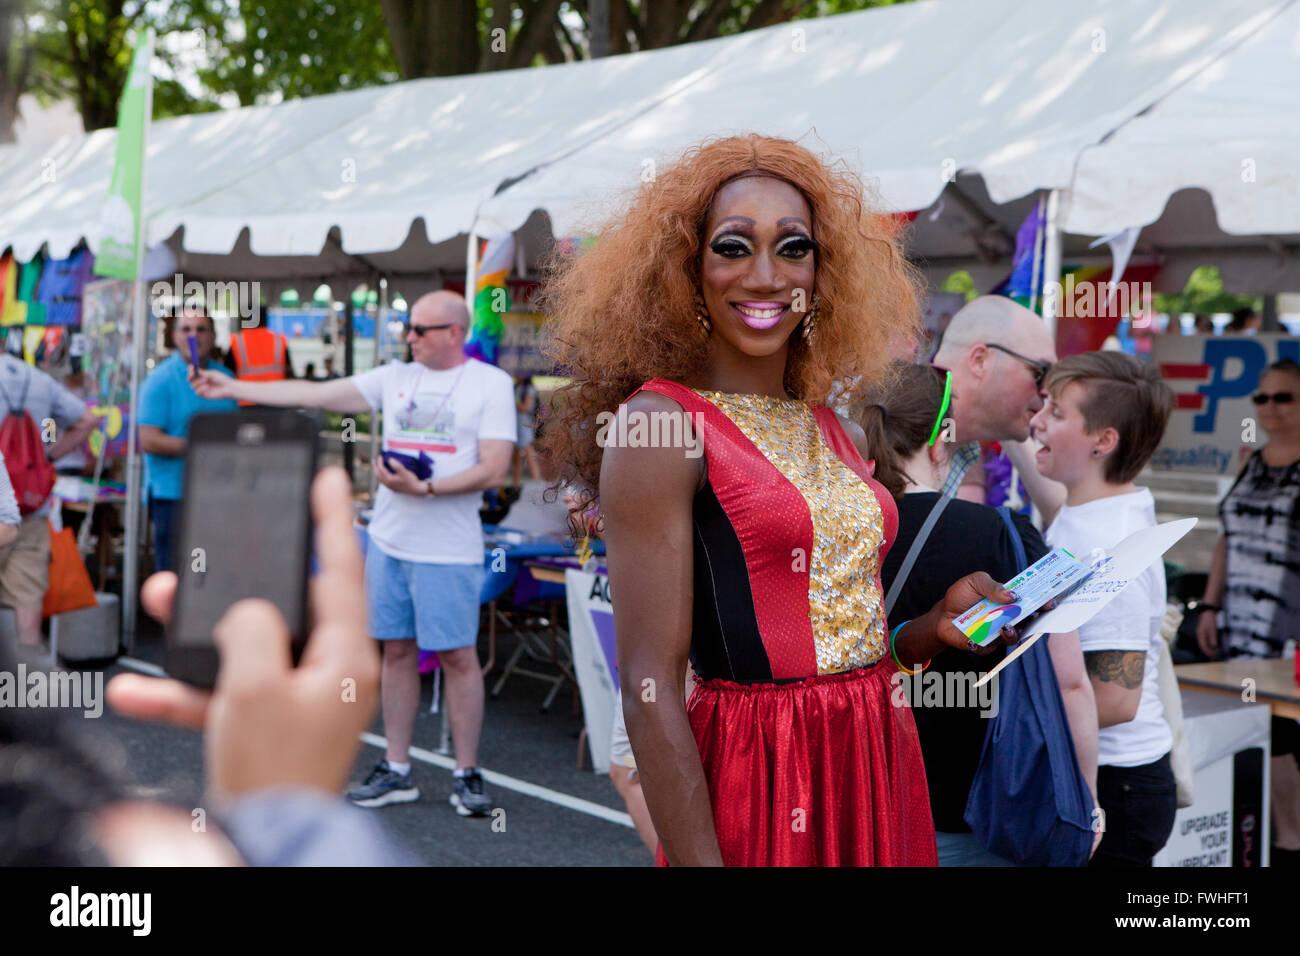 Washington DC, USA. 12th June, 2016. Thousands of participants celebrate Pride month in Washington, DC USA Credit: - Stock Image